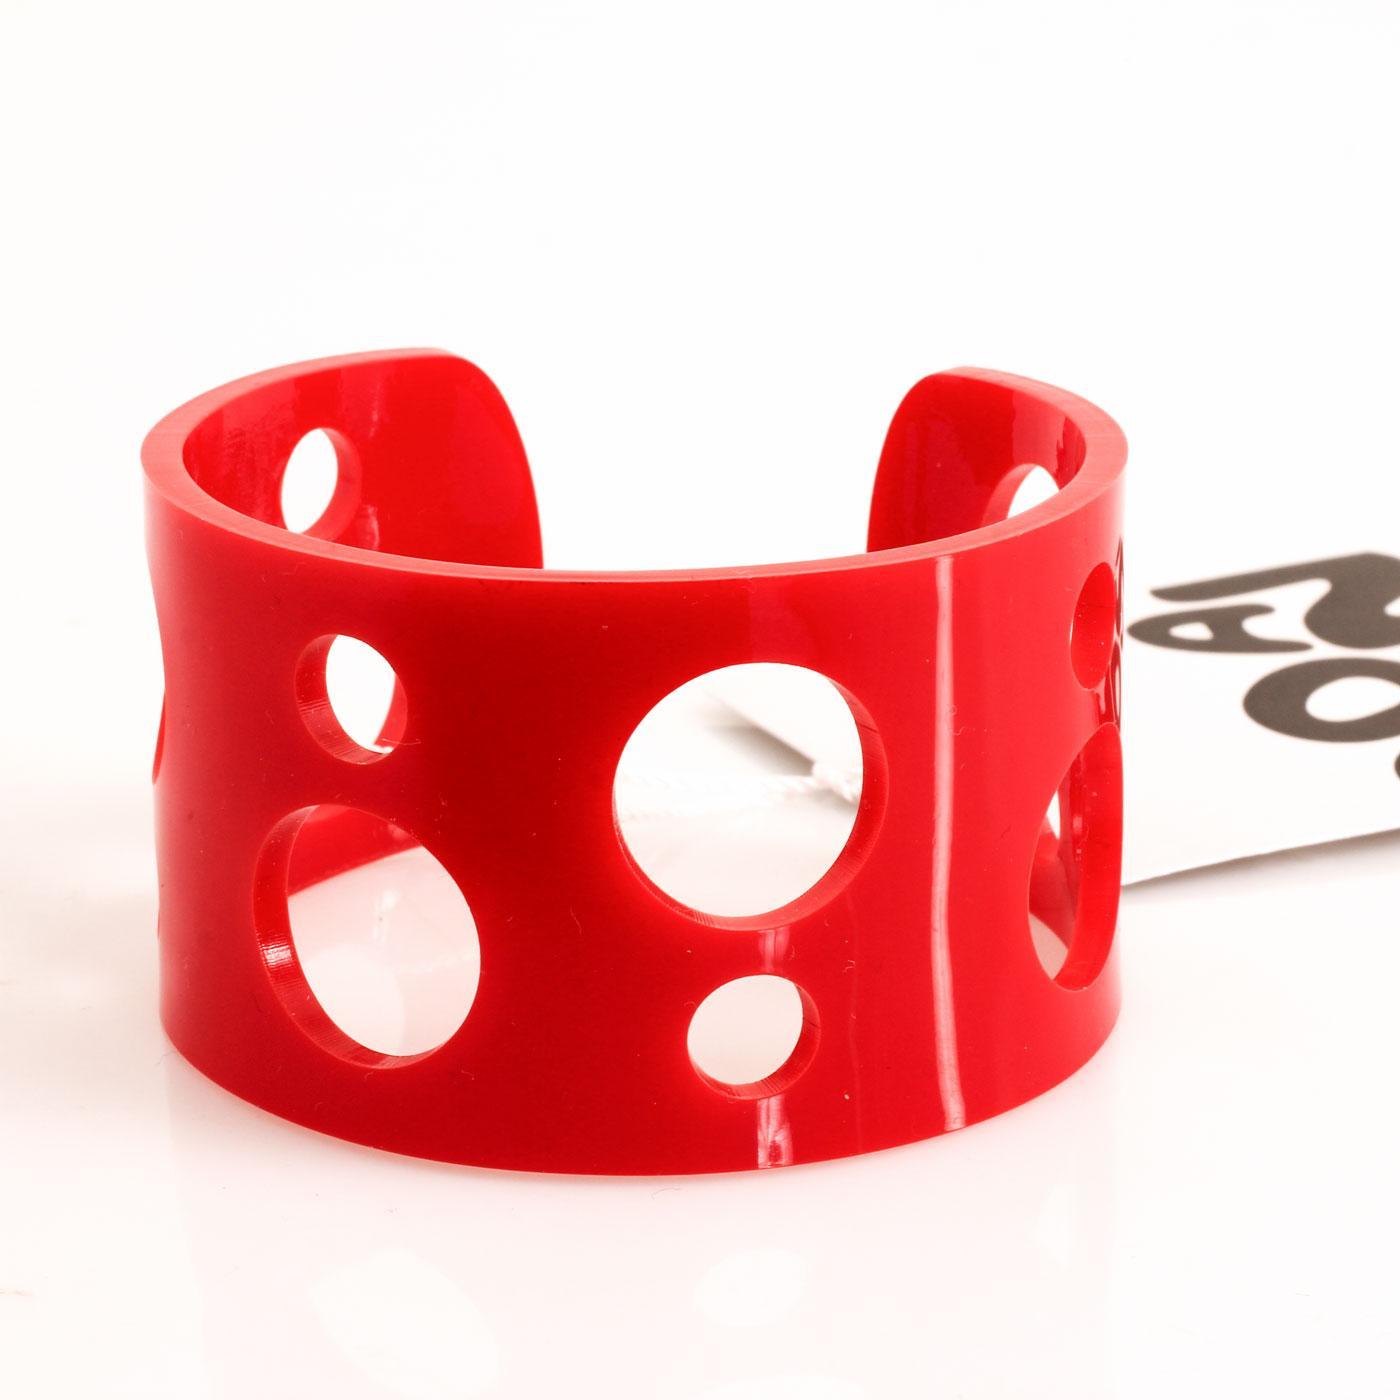 Ada Binks for Madcap England Women's 60s Mod Circle Cuff Bracelet in Red